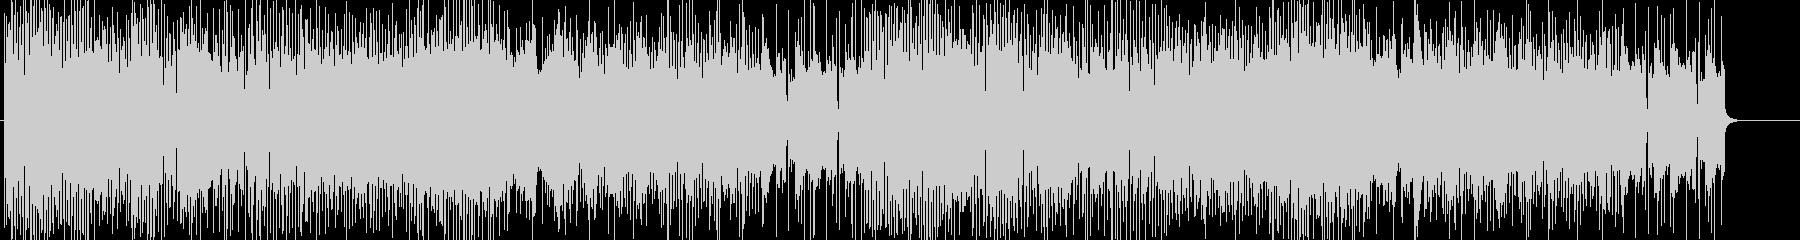 「HR/HM」「DEATH」BGM166の未再生の波形